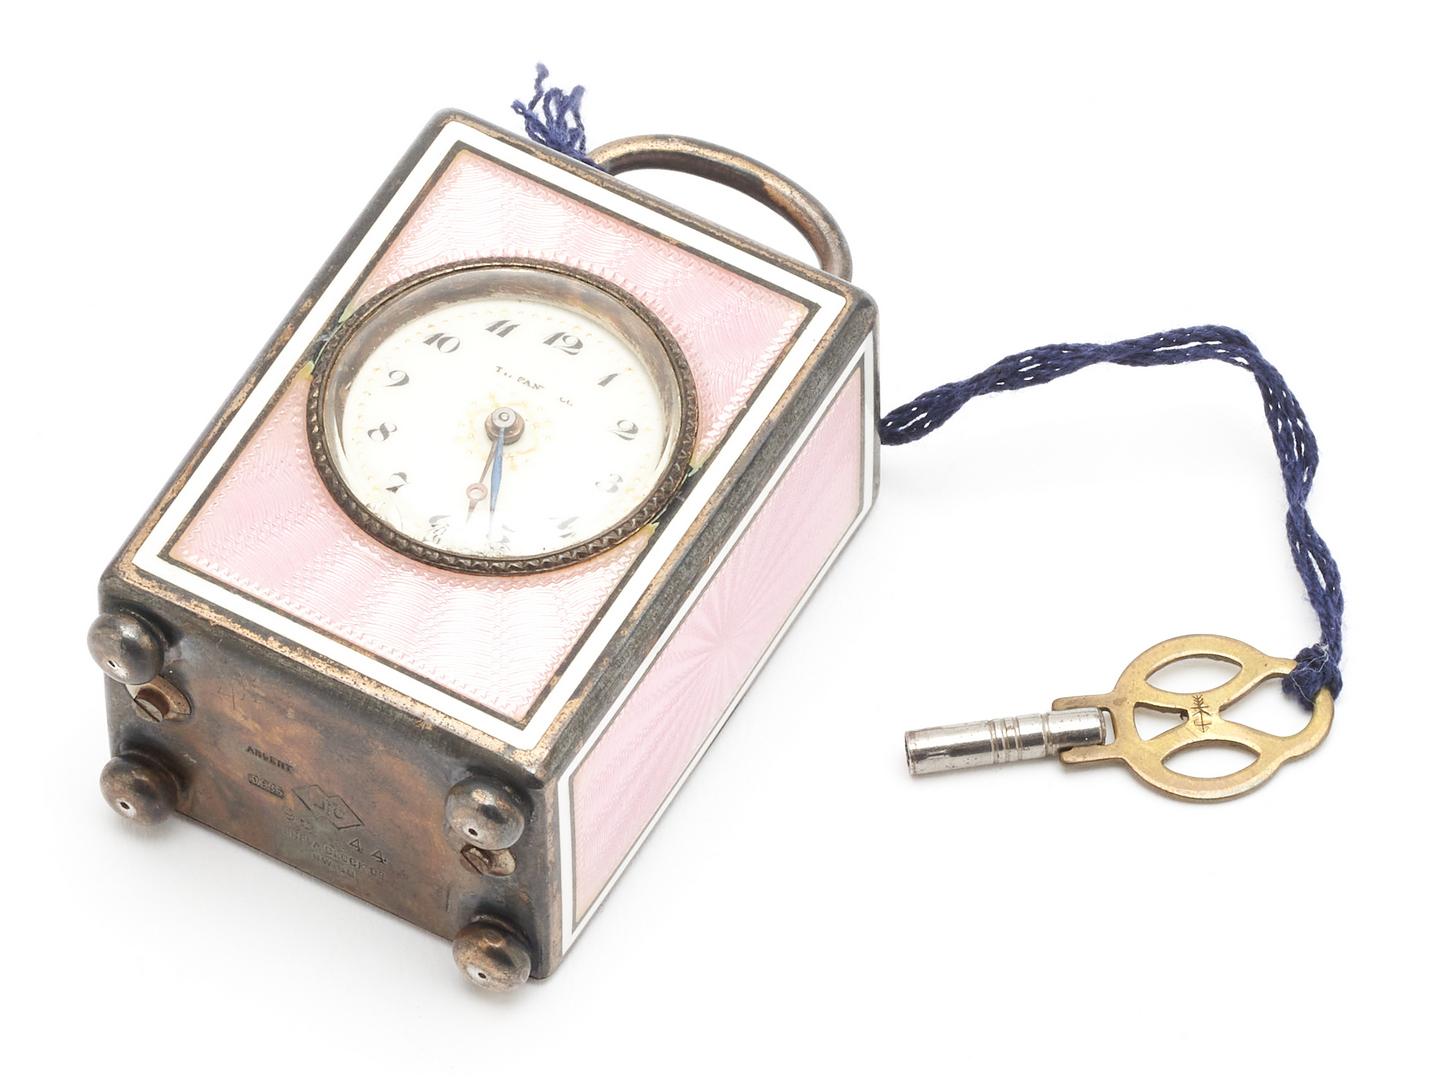 Lot 72: Tiffany & Co. Guilloche Enameled Clock